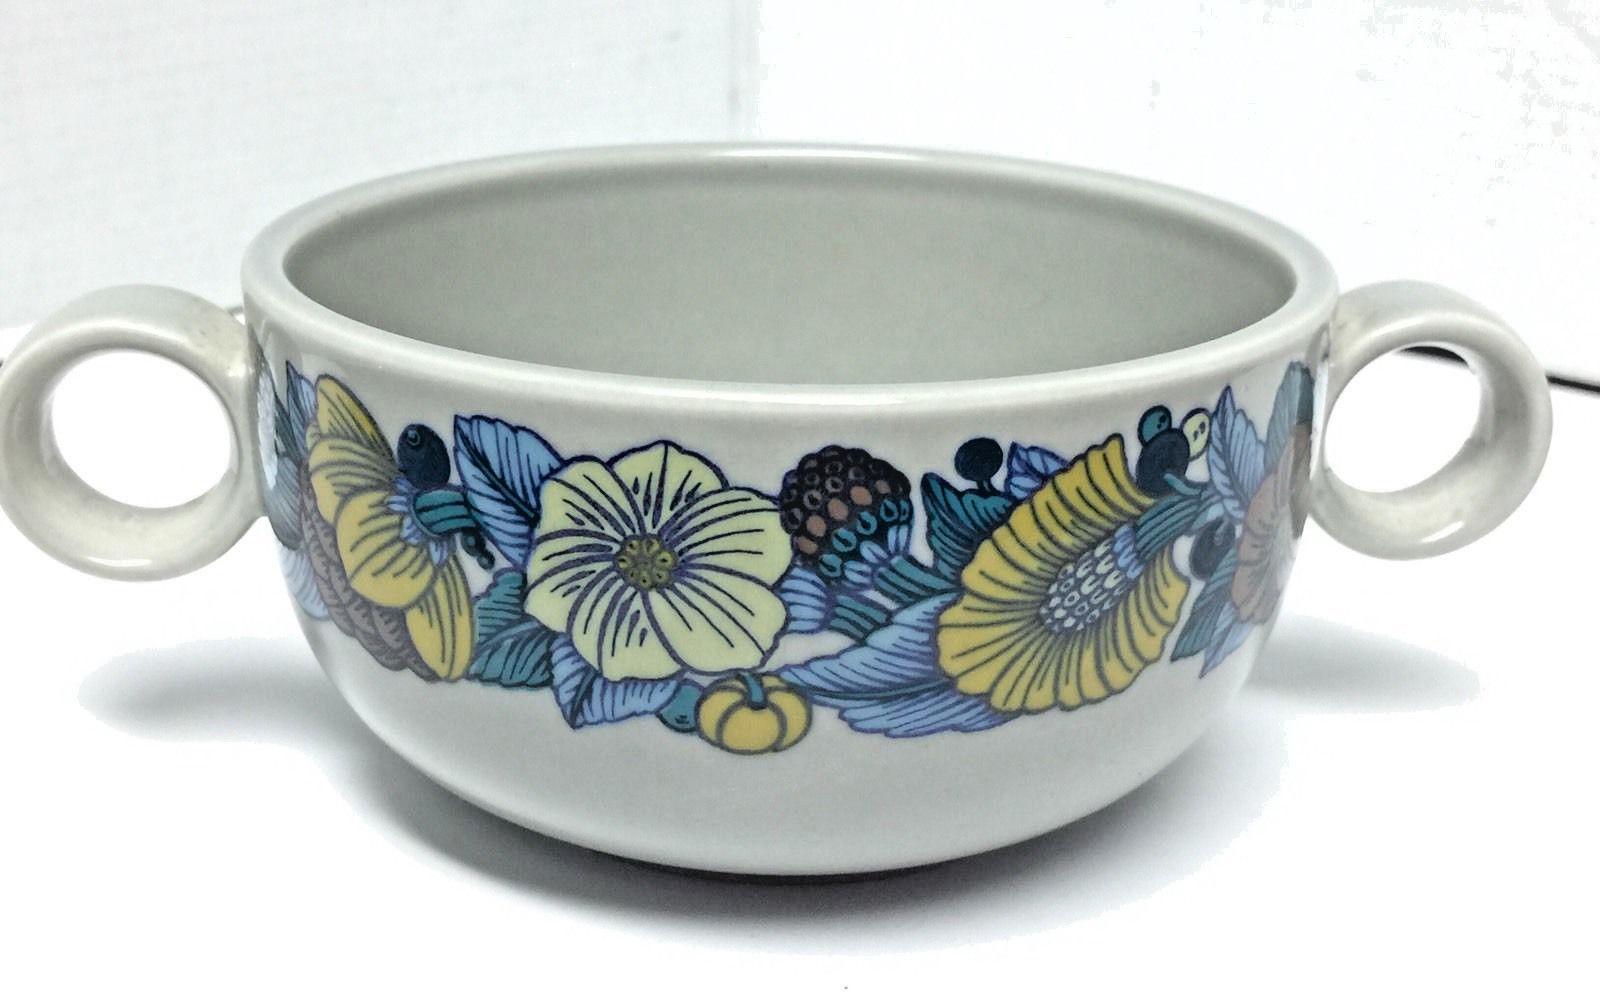 Rosenthal Studio Linie Terra Prato Blau Grau Soup Bowl Blue Yellow Gray Le Foll - $37.23